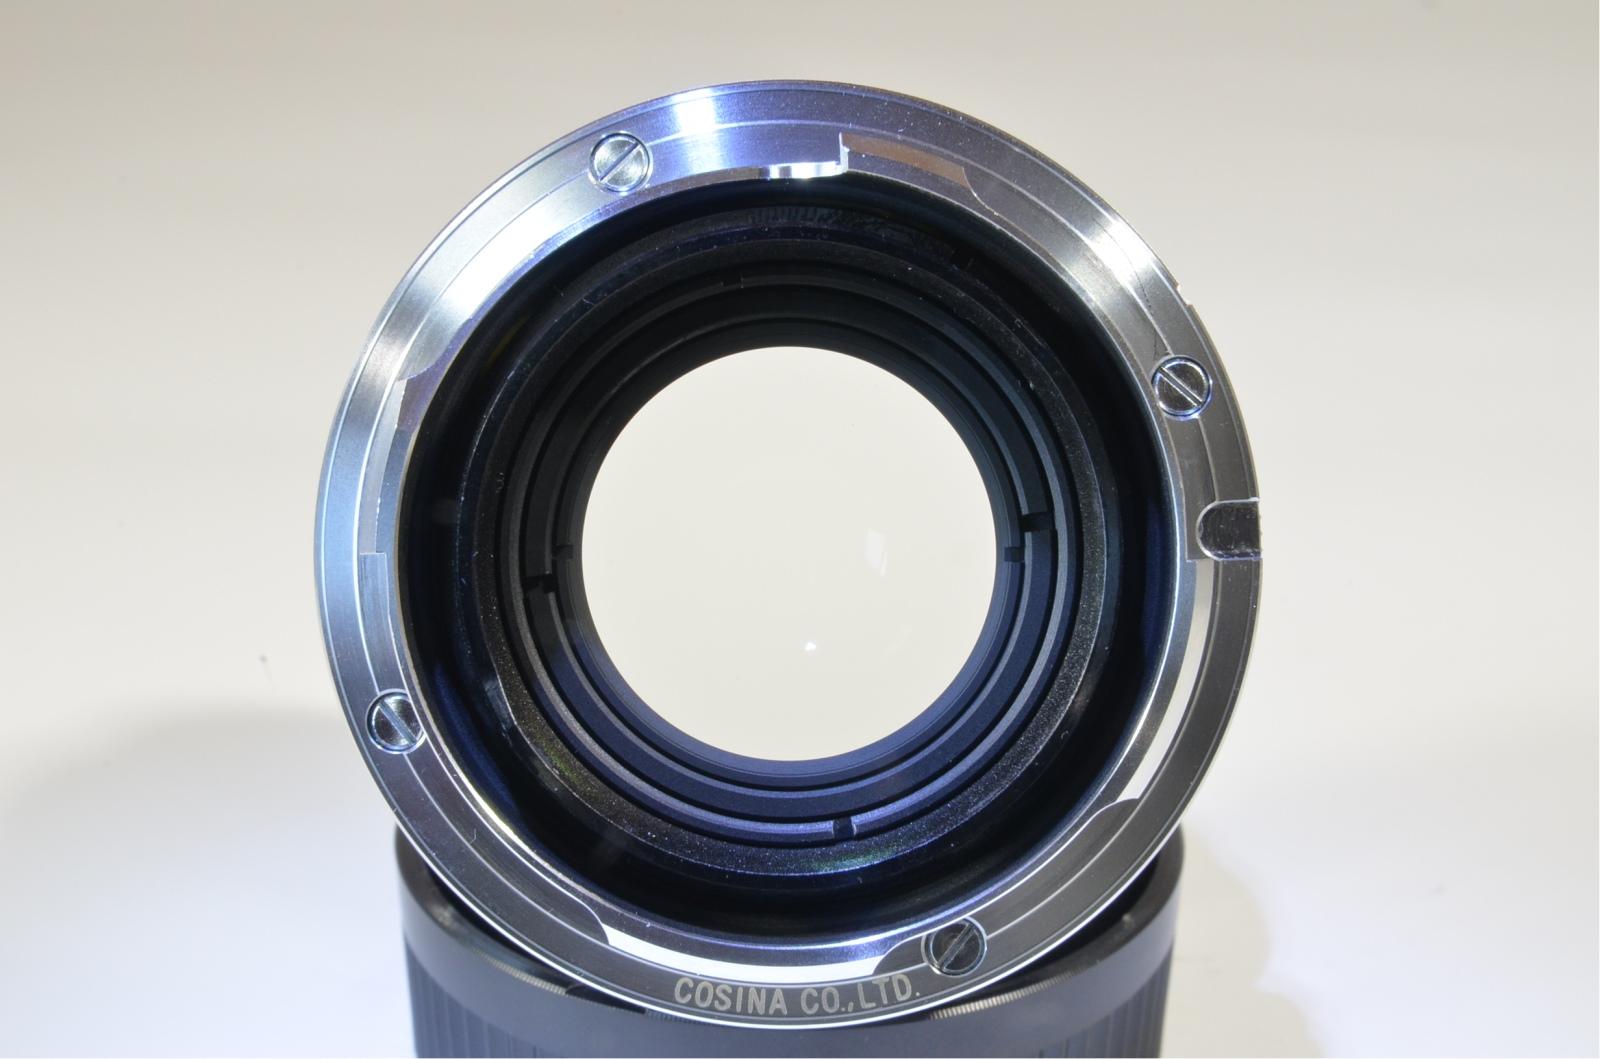 voigtlander nokton 50mm f1.5 aspherical vm for leica